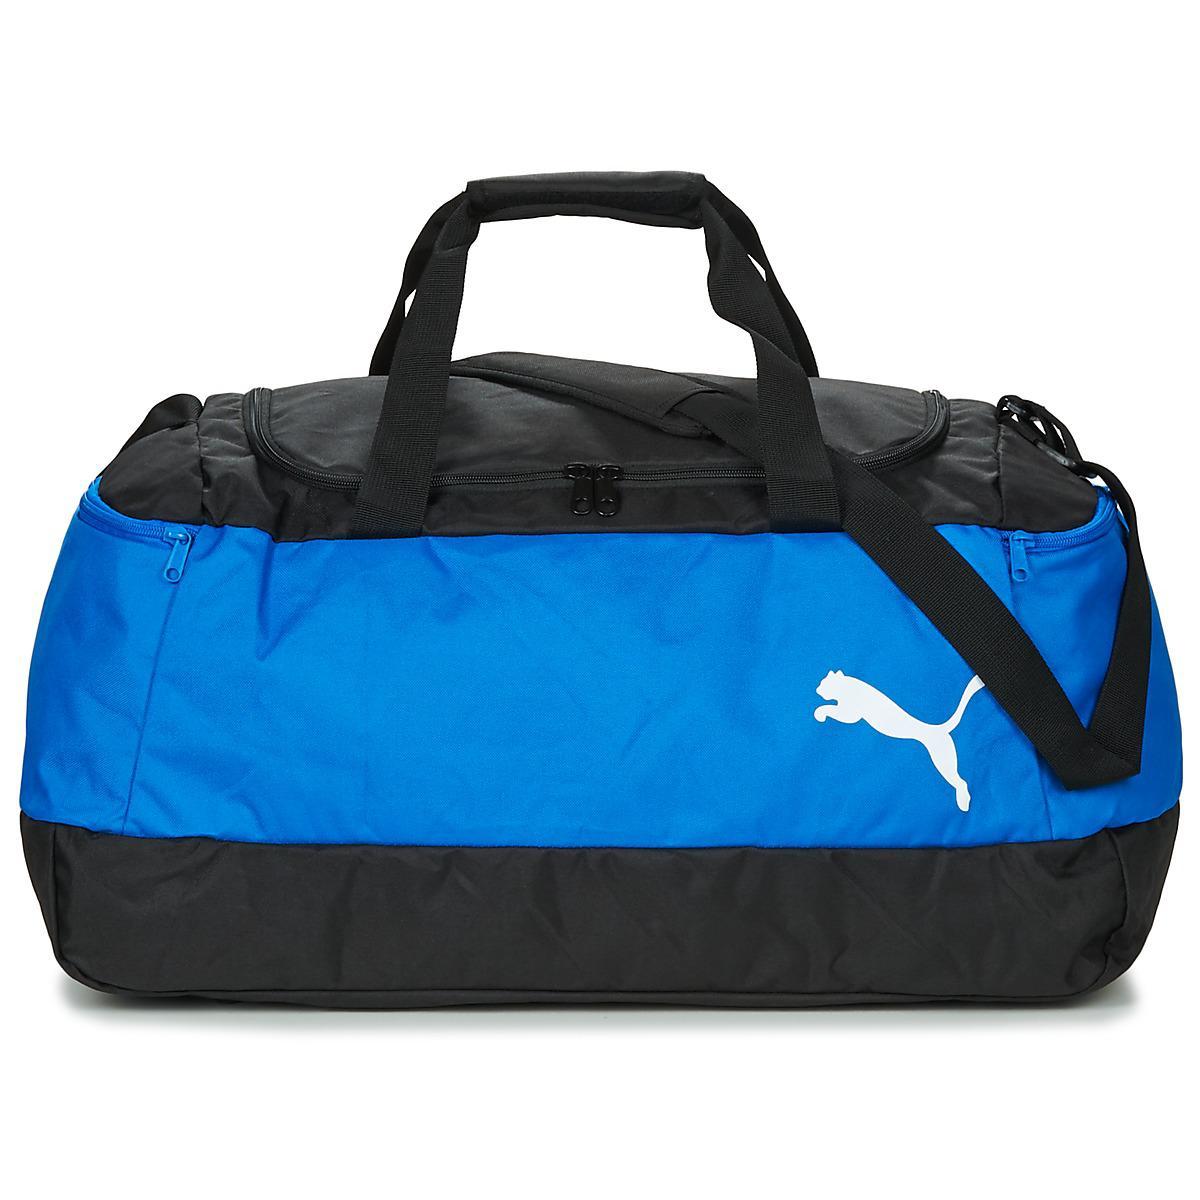 bc6c6bdf3e68 PUMA Pro Training Ii Medium Bag Men s Sports Bag In Black in Black ...